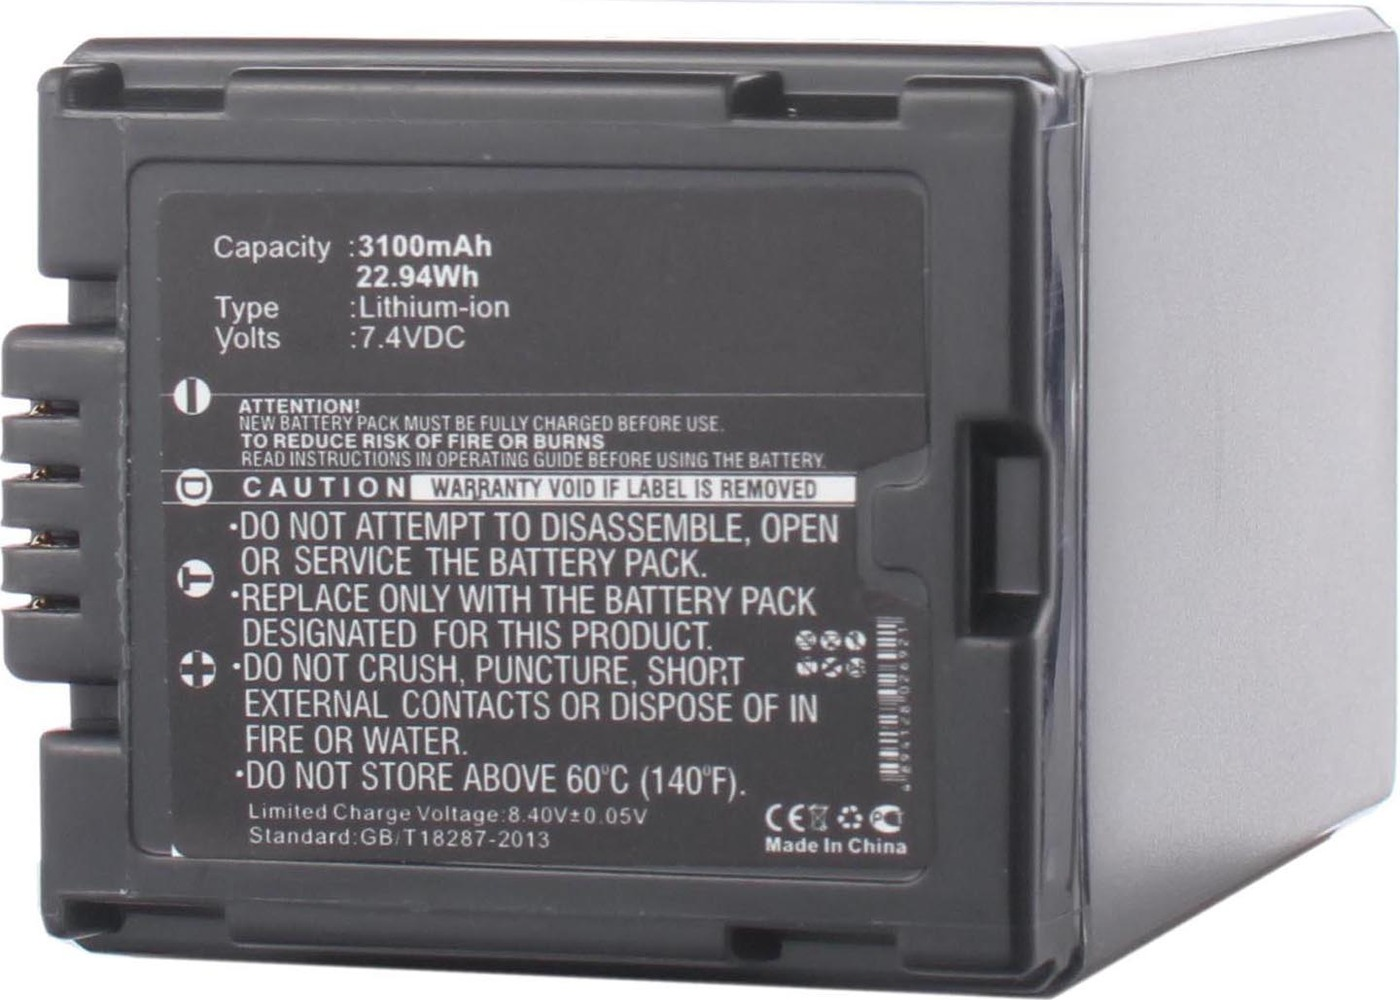 Аккумуляторная батарея iBatt iB-T1-F361 3100mAh для камер Hitachi DZ-MV350E, DZ-MV730E, DZ-BD70, DZ-GX3100E, DZ-MV380, DZ-BD7H, DZ-MV750E,  для Panasonic NV-GS27, NV-GS300, NV-GS400, NV-GS500, NV-GS35, SDR-H280, NV-GS6, SDR-H20, NV-GS230, NV-GS180,